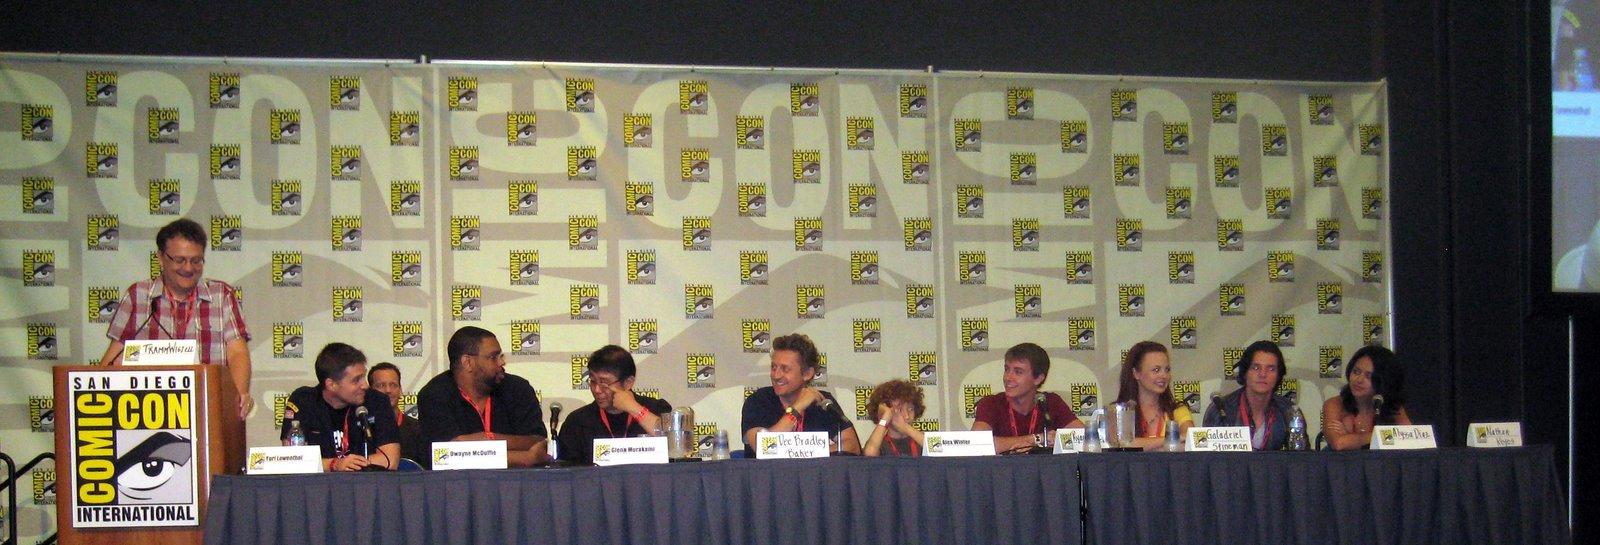 Ben 10 ComicCon panel director Alex Winter and cast